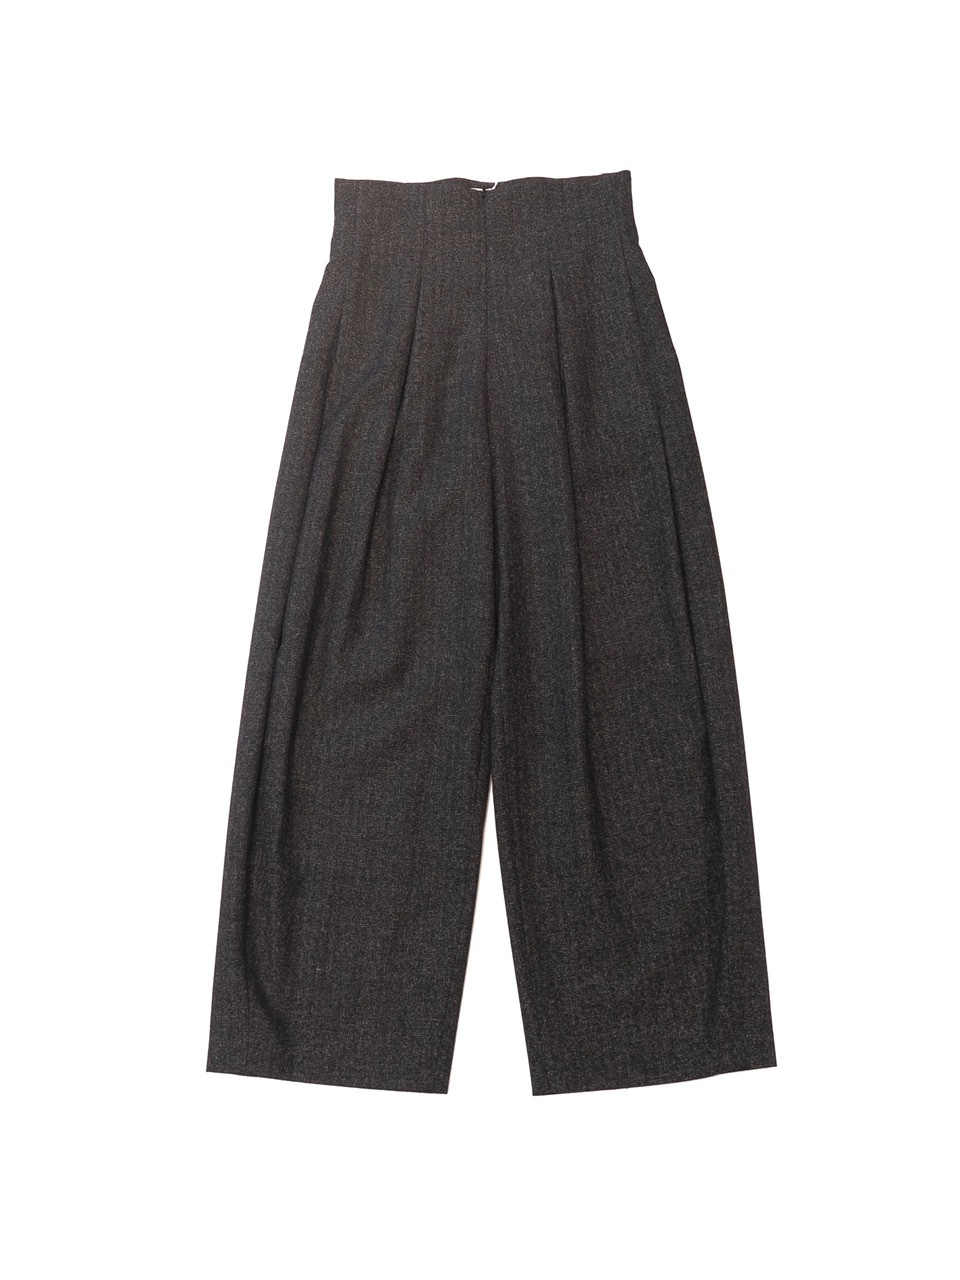 【ELIN】HEATHER HIGH WAIST PANTS